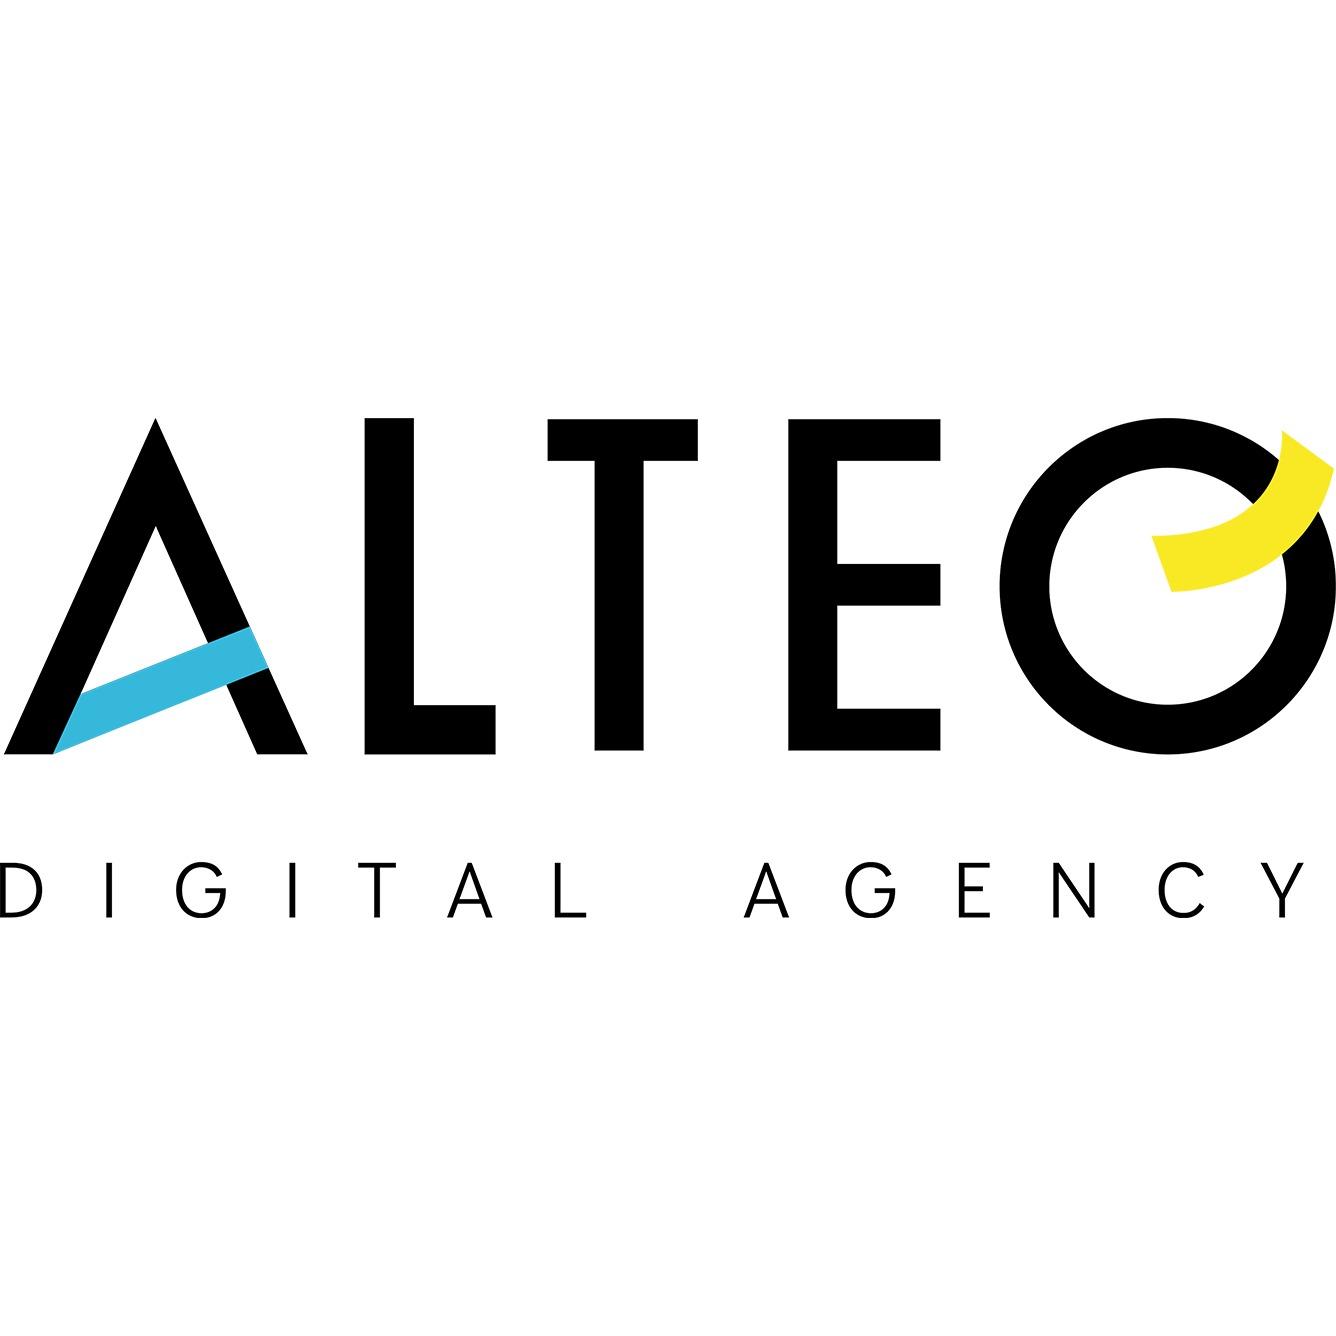 the Alteo logo.